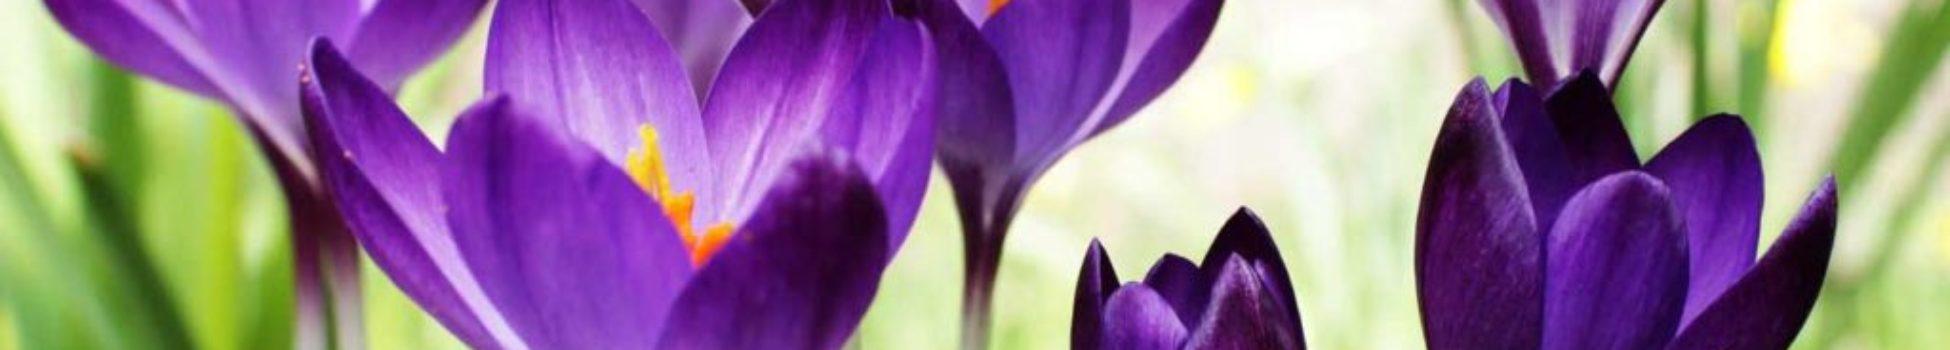 abril-telares-mimiatura